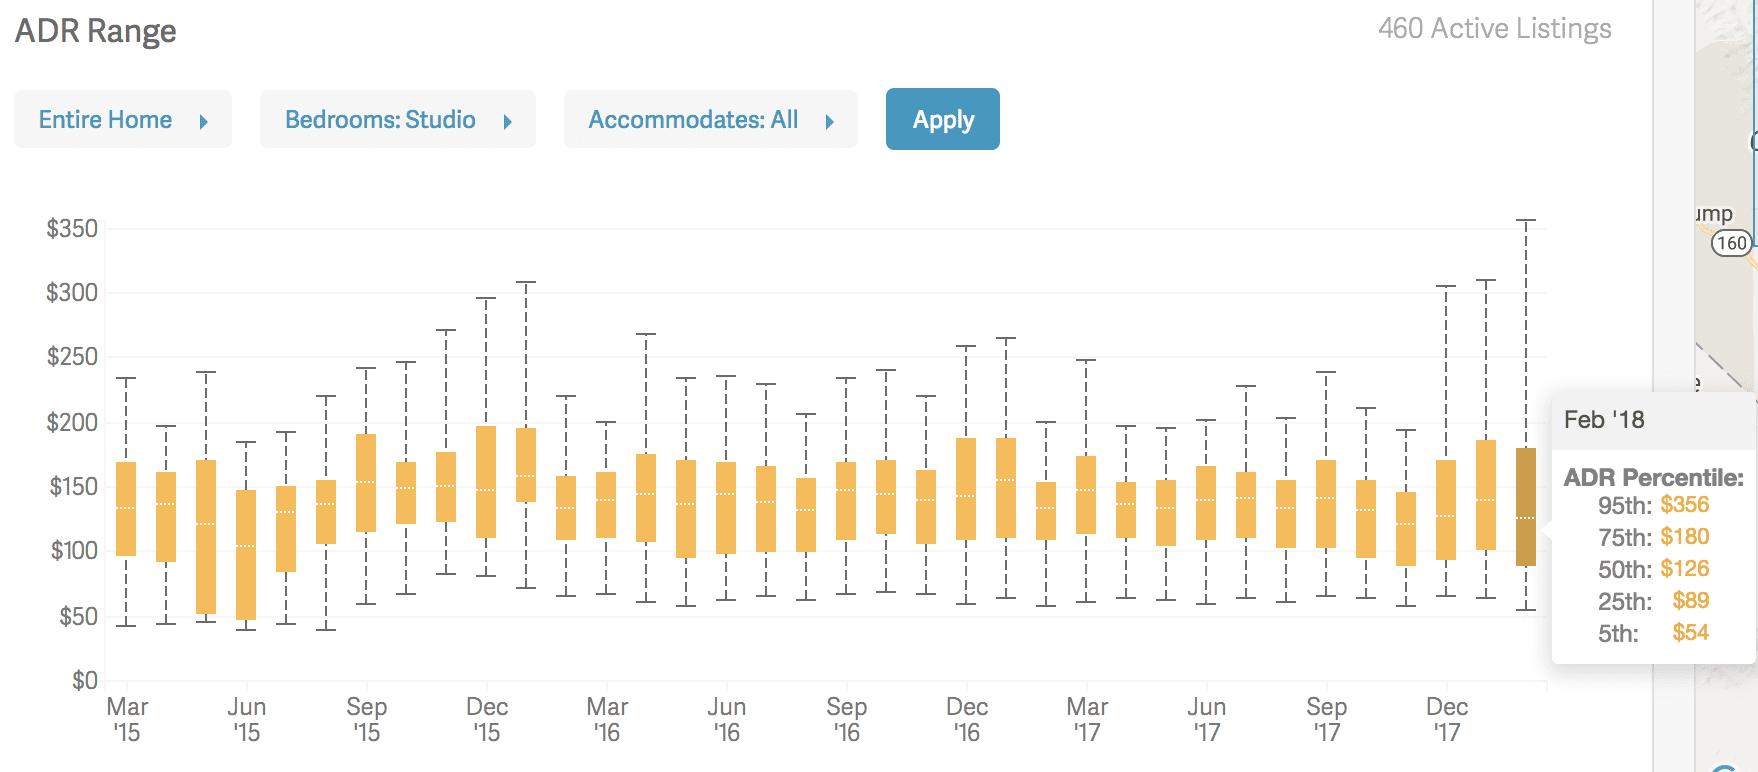 AirDNA MarketMinder Review - ADR Range